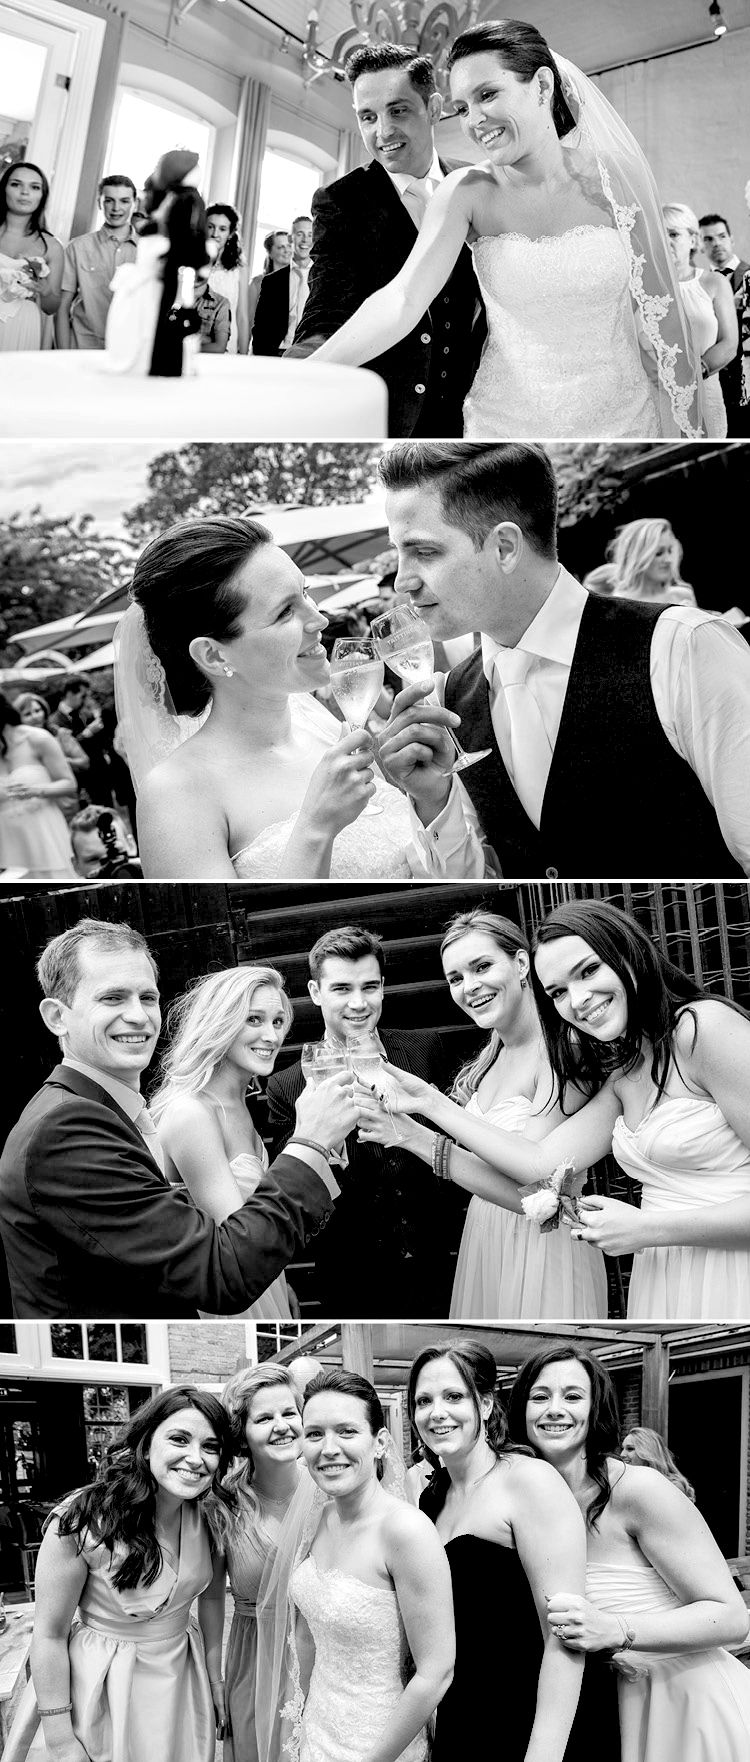 bruidsreportage-blog-willem-nicole-11